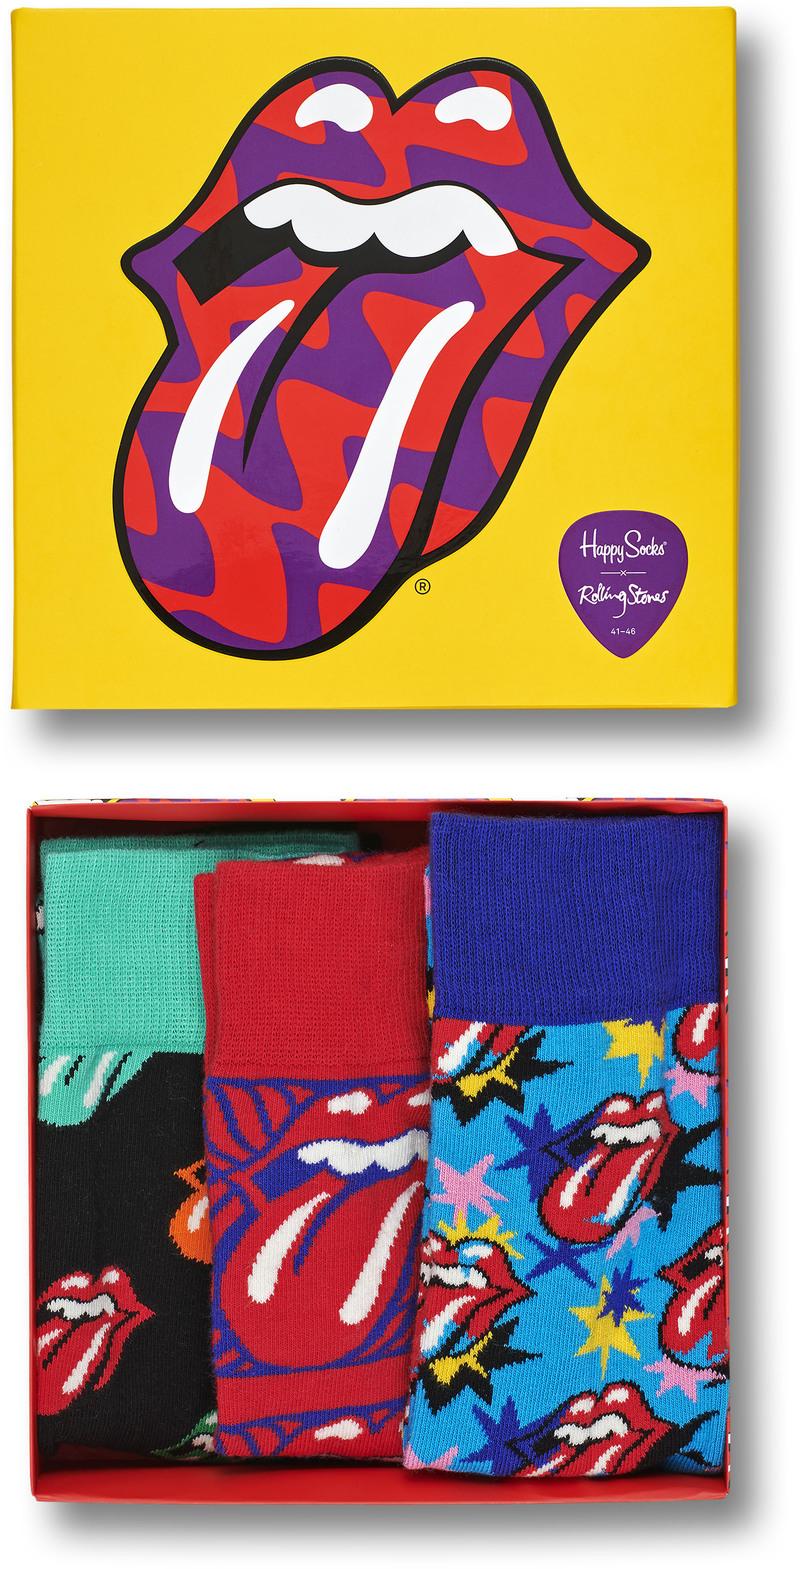 Happy Socks Rolling Stones Gift Box foto 1